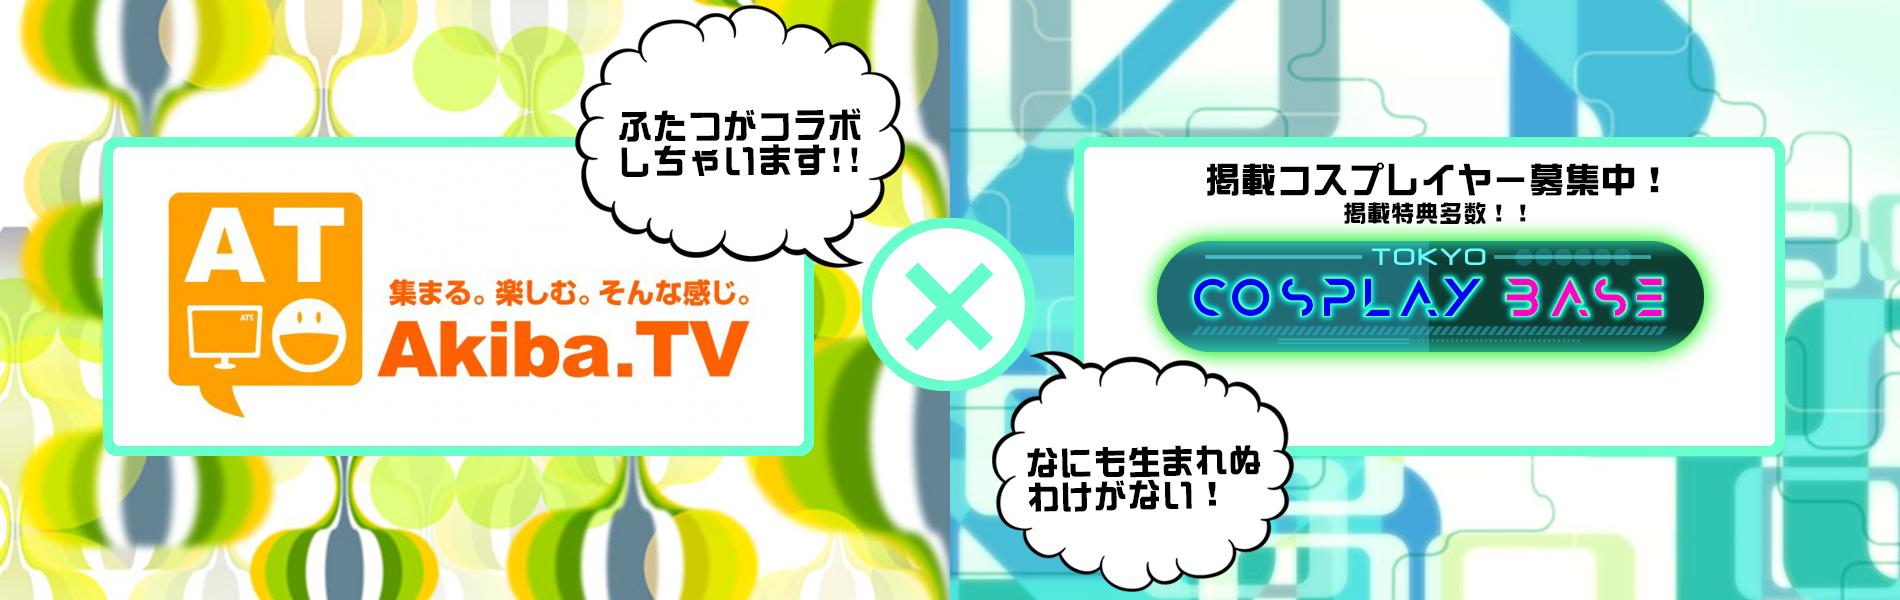 AkibaTV-COSPLAYBASE コスプレイヤーデータベース